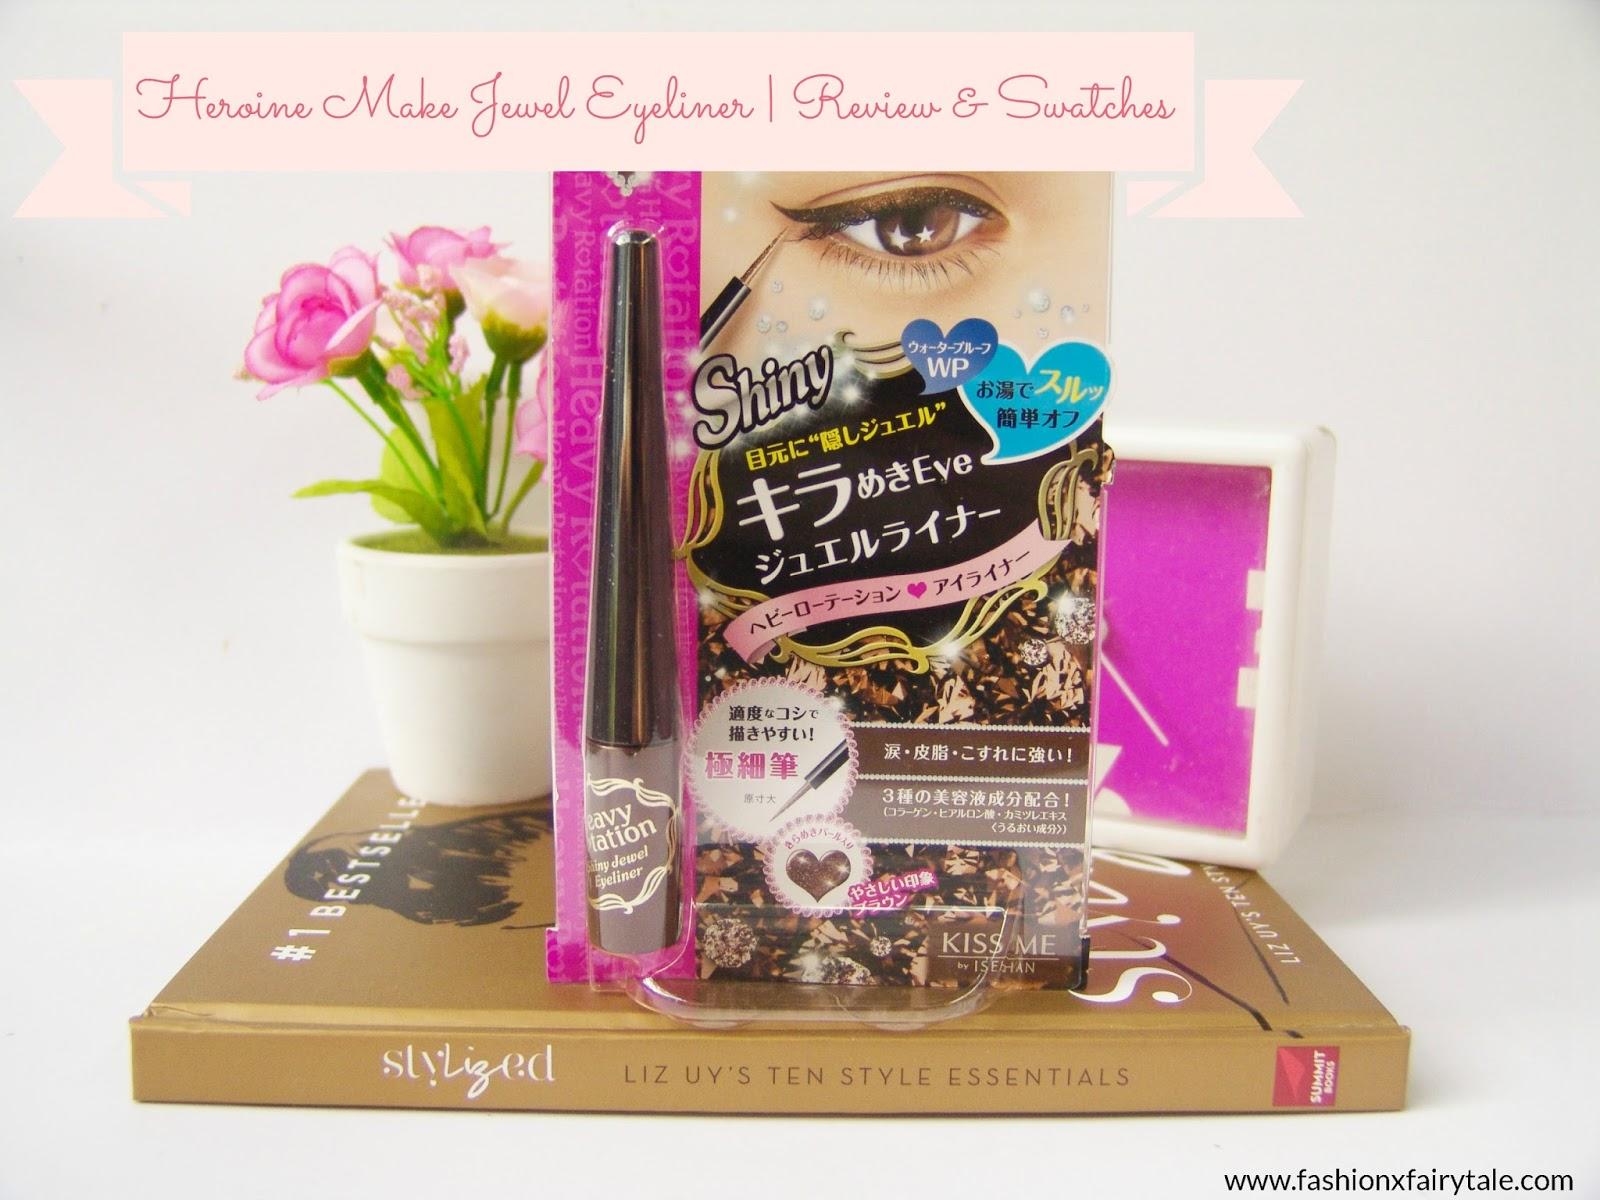 Heroine Make Jewel Eyeliner in 02 | Review & Swatches